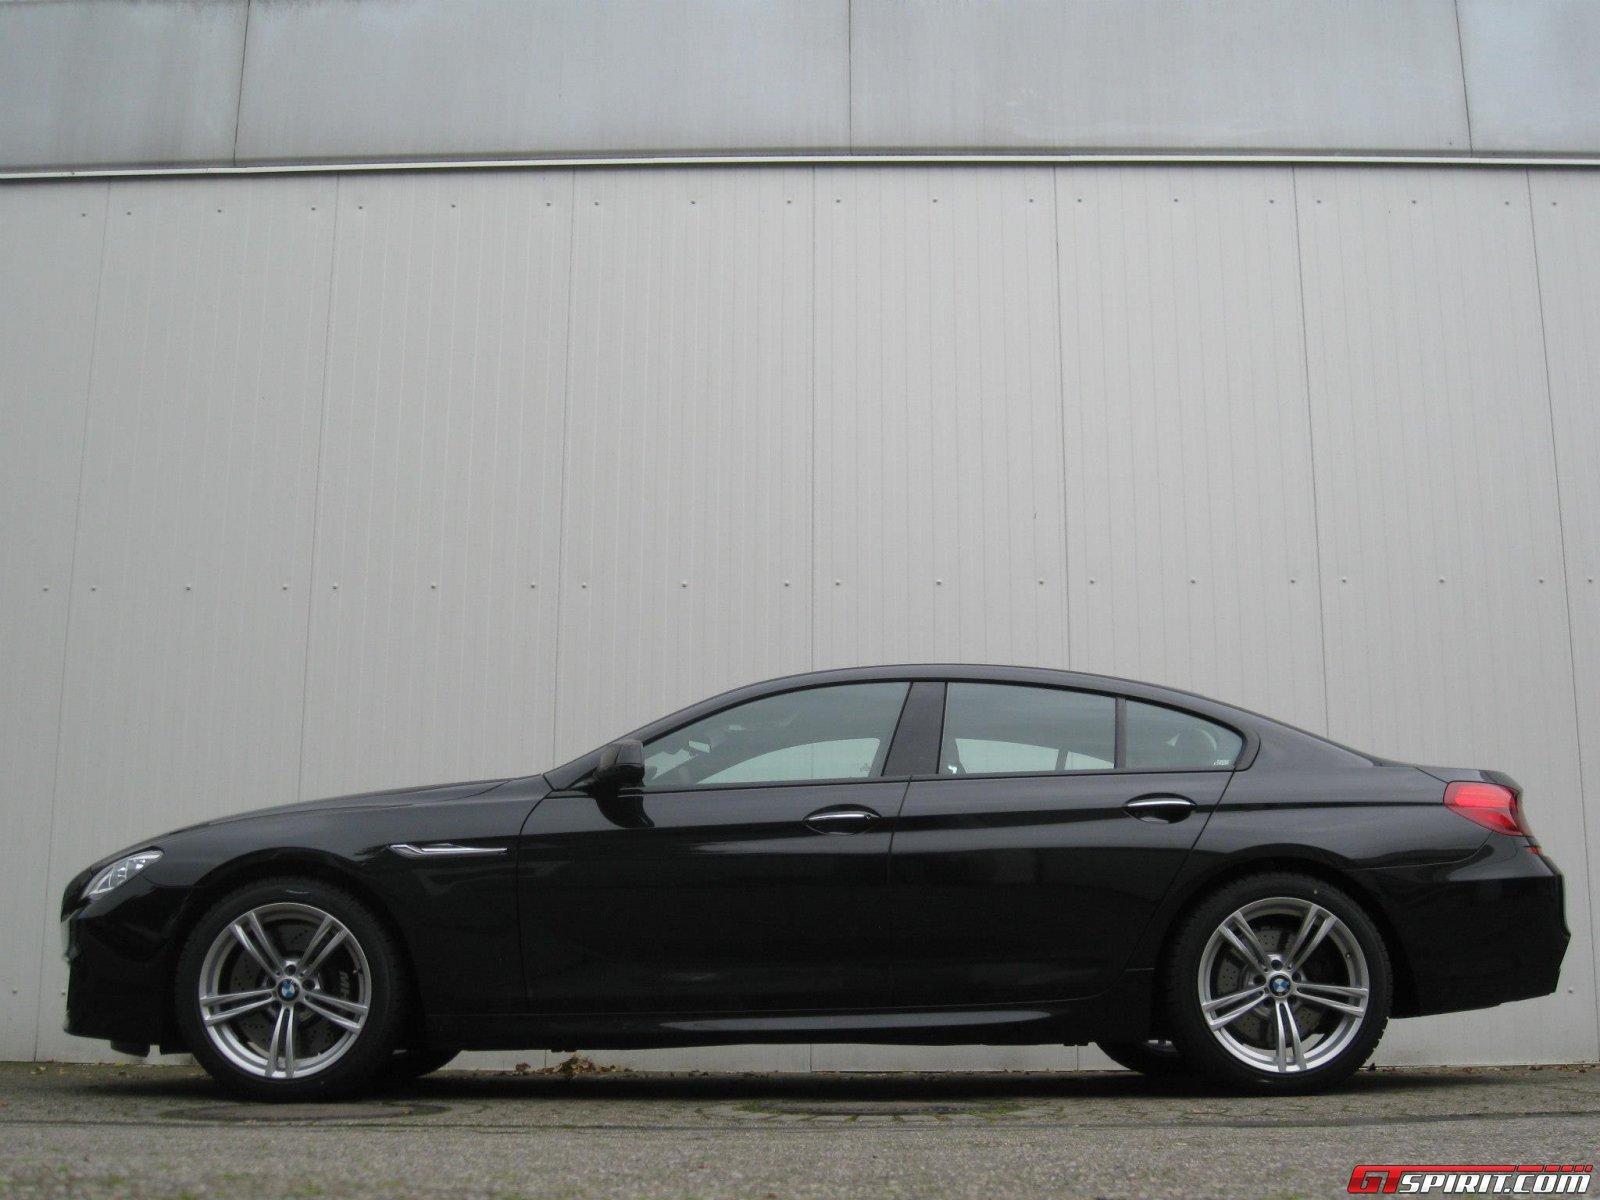 http://www.gtspirit.com/wp-content/gallery/bmw-650xi-grand-coupe-by-manhart-racing/665747_421979354522353_501717382_o.jpg